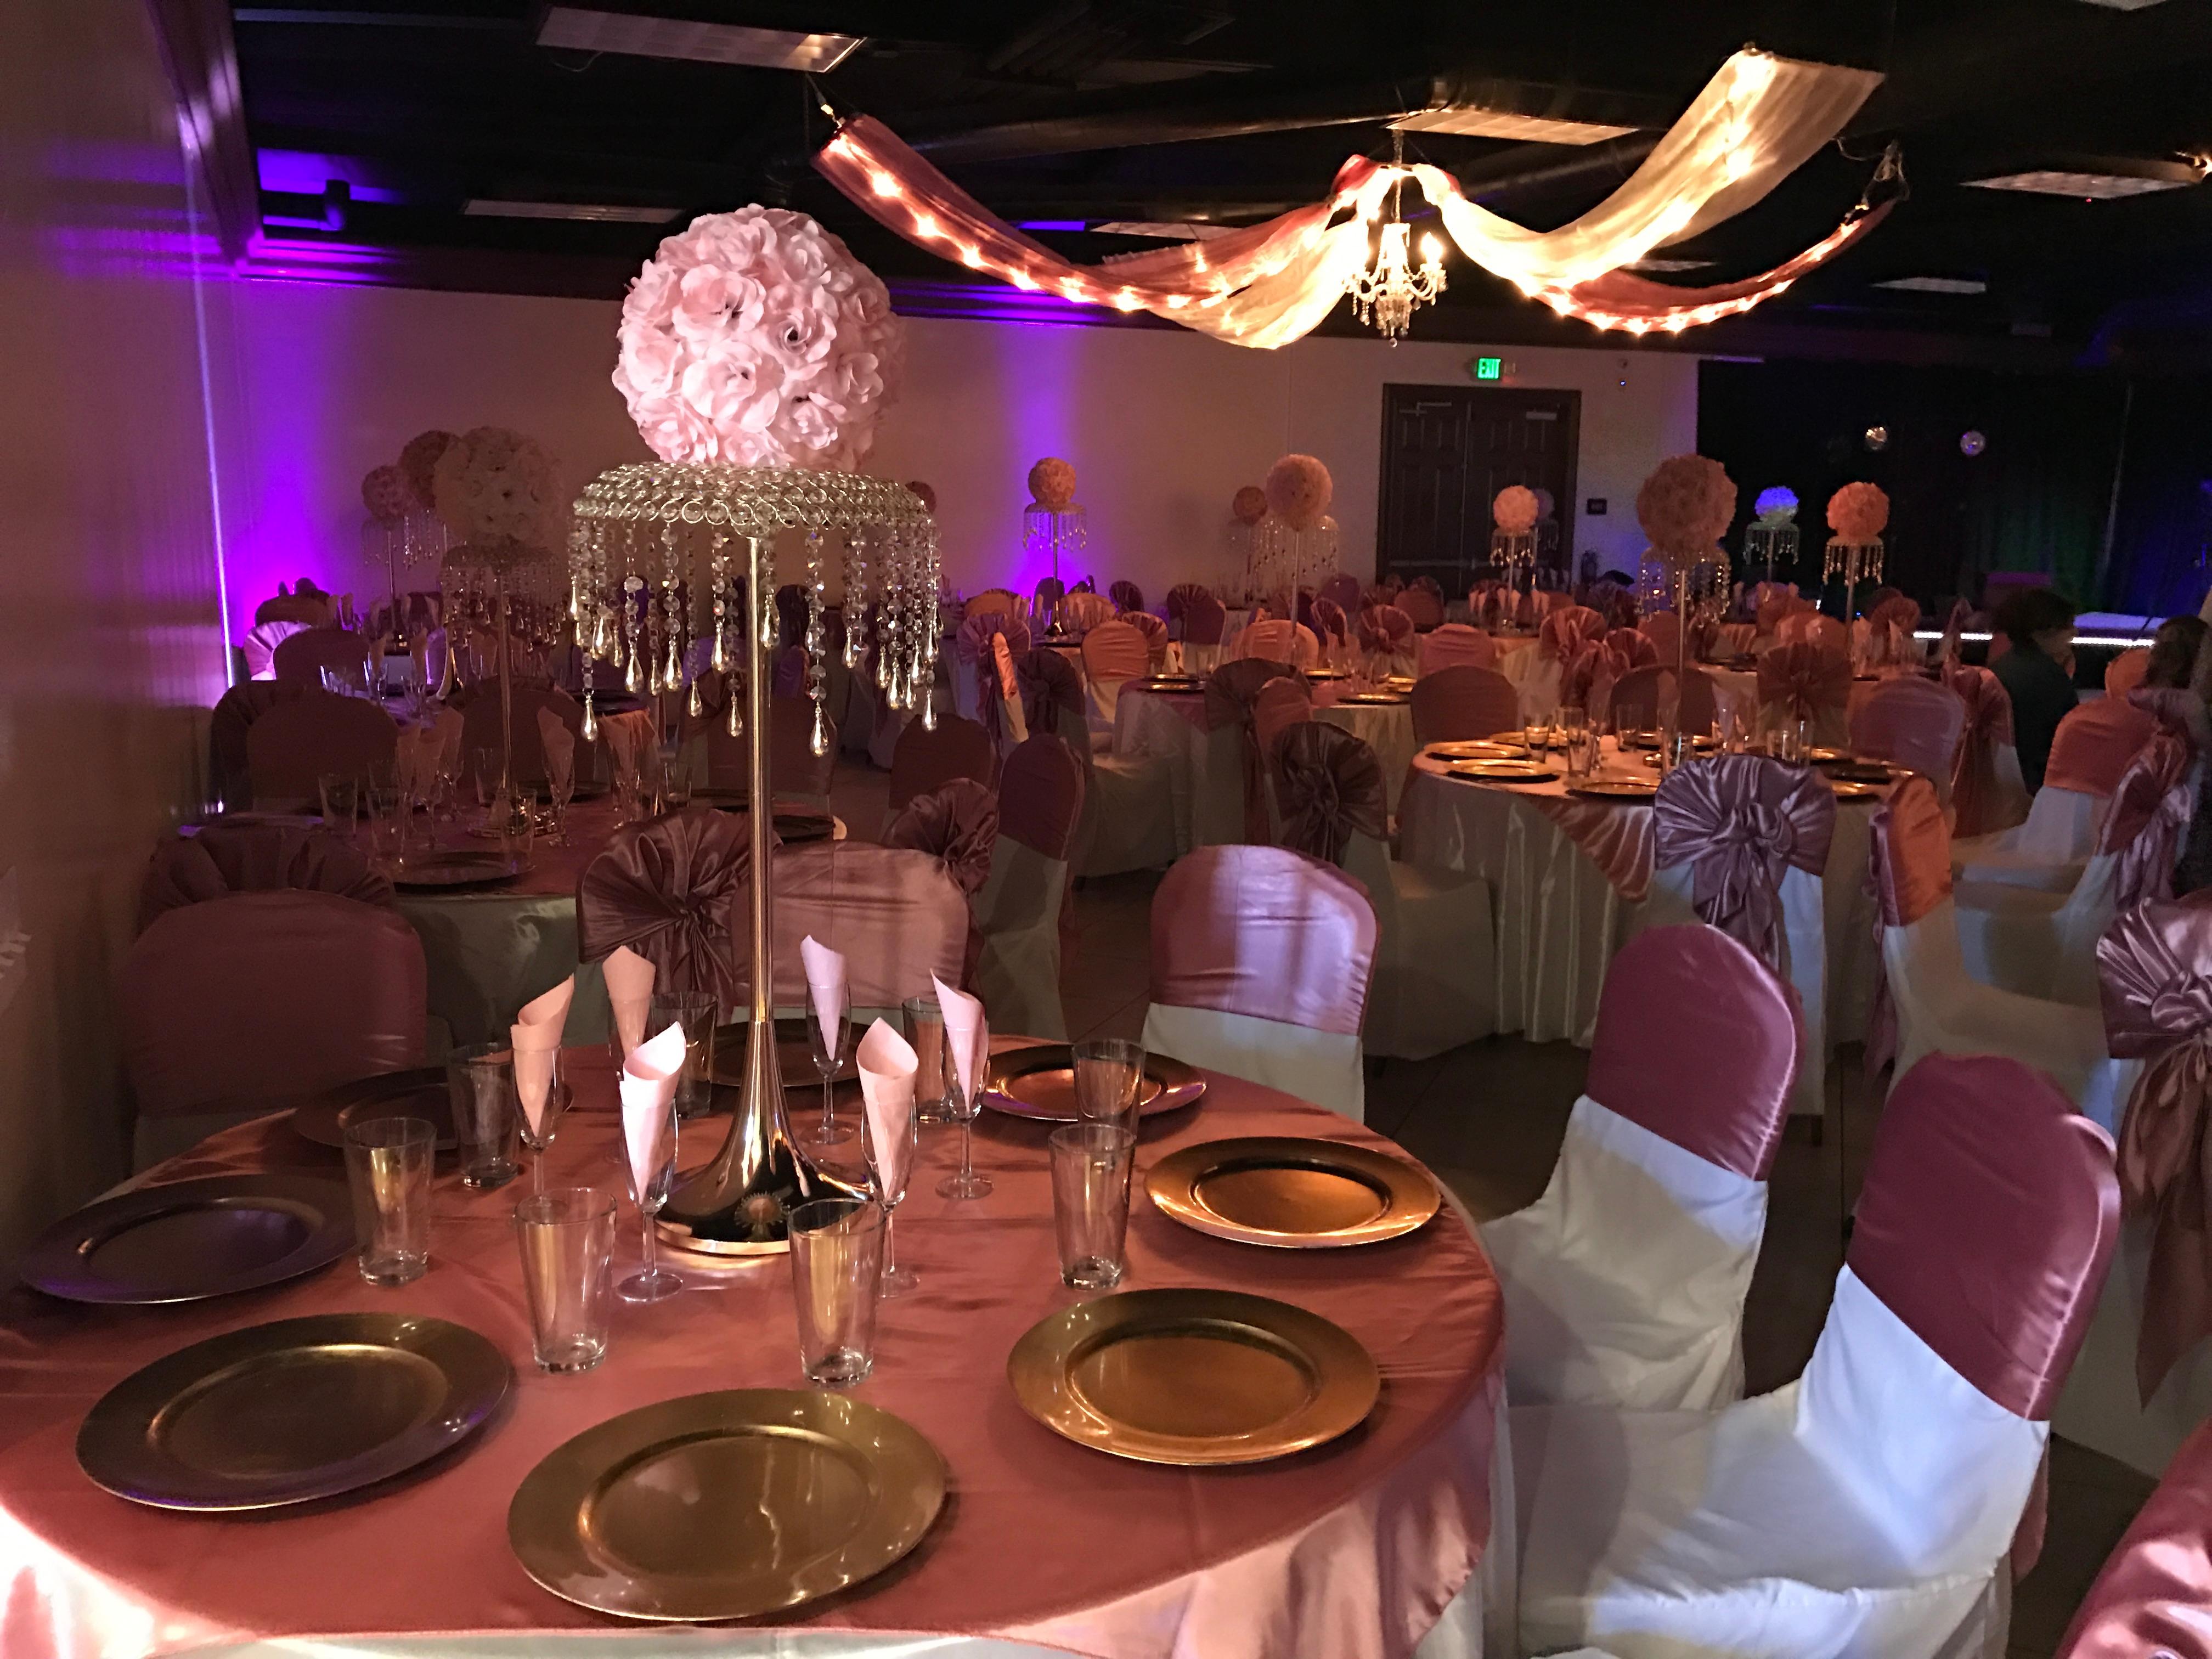 Arrowhead Events Center In San Bernardino Ca 909 684 5